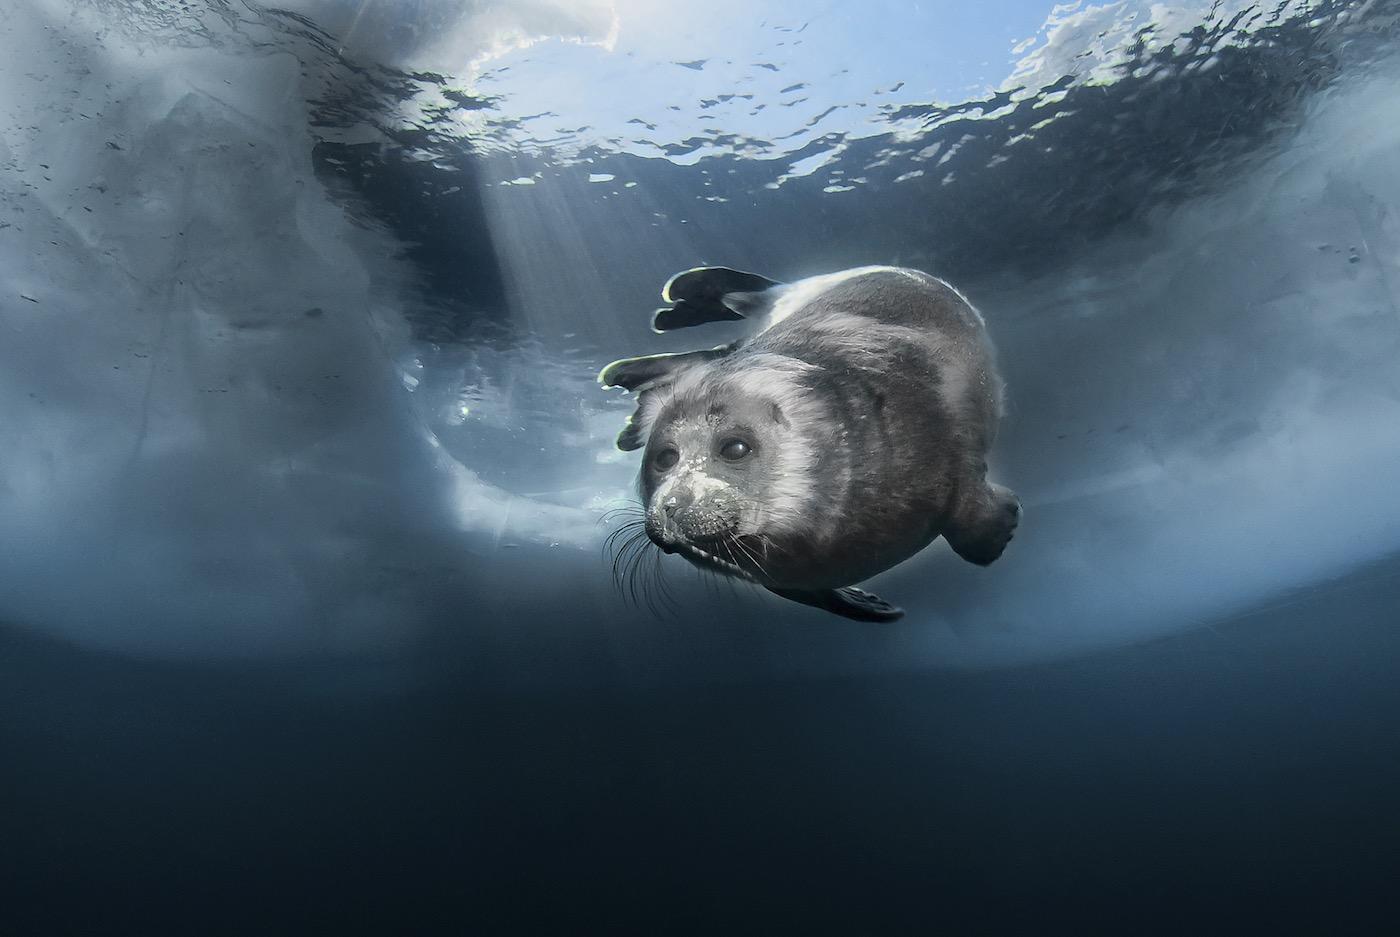 Young Baikal seal (Pusa sibirica) at breathing hole. Credit: bioGraphic.